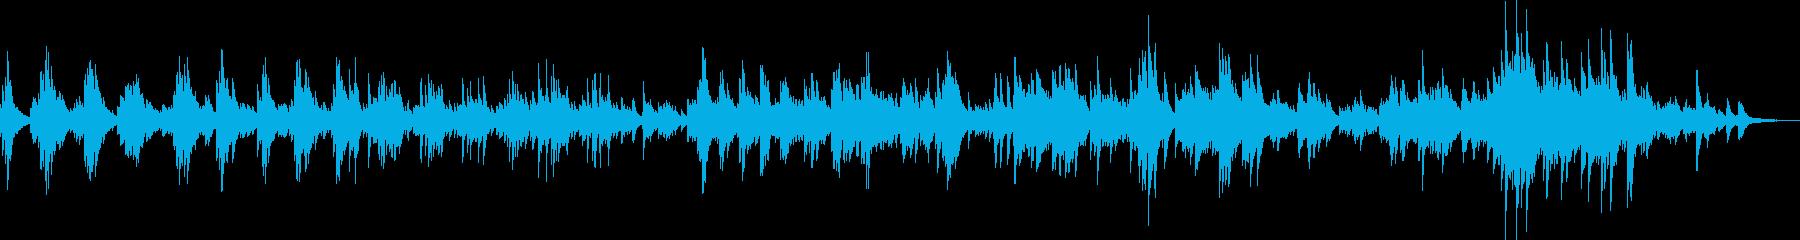 Tragic piano solo song's reproduced waveform